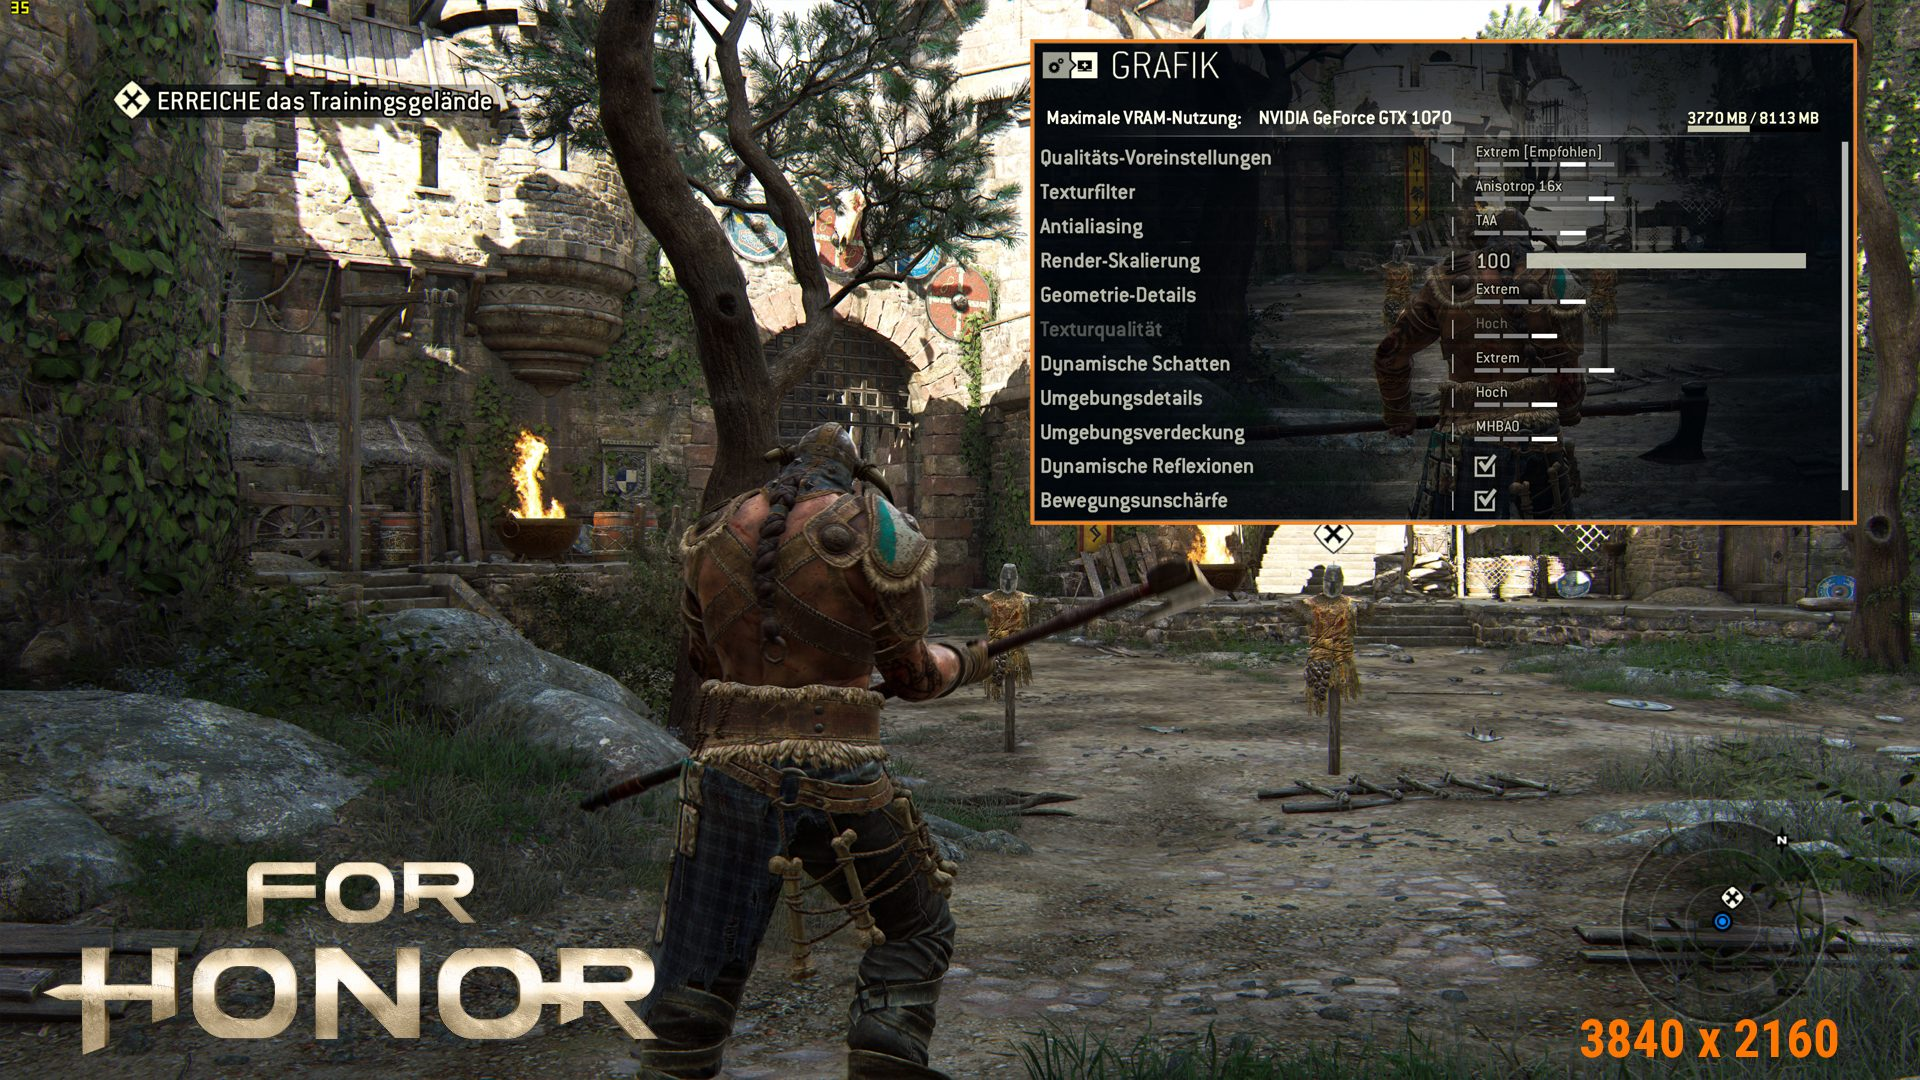 Acer-Predator-17-G9-793-79NC-Grafik_2k4k-9